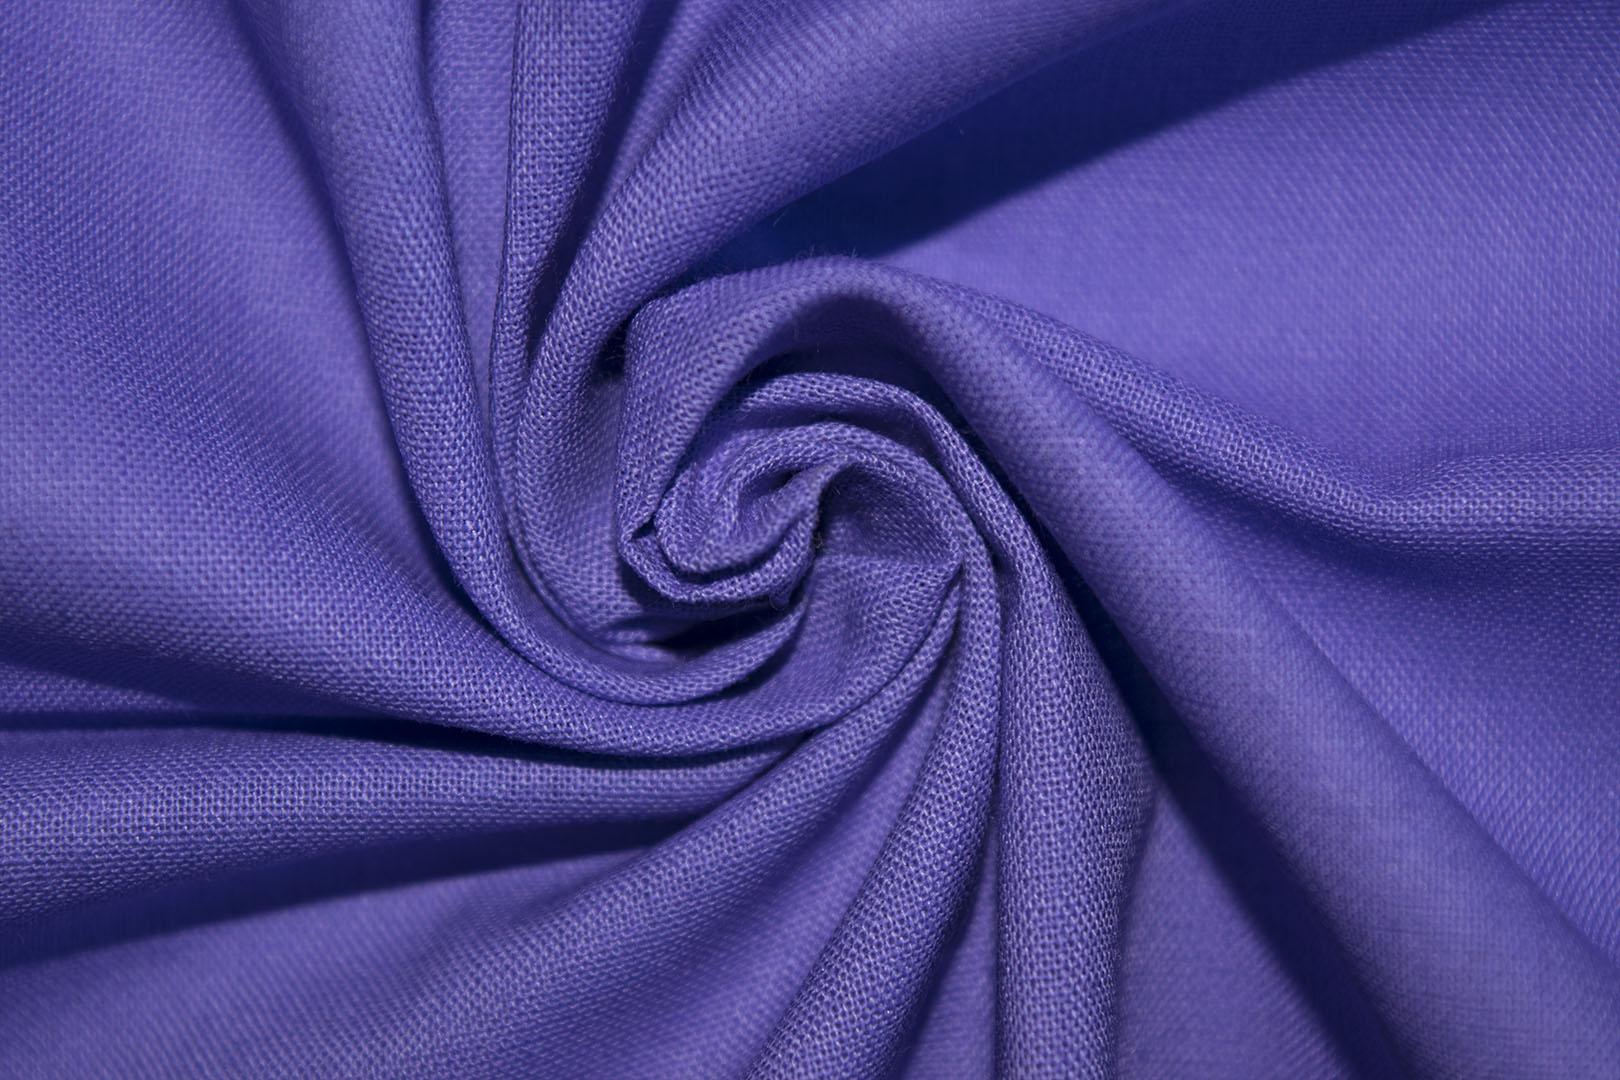 homespun_purple62317   3/28